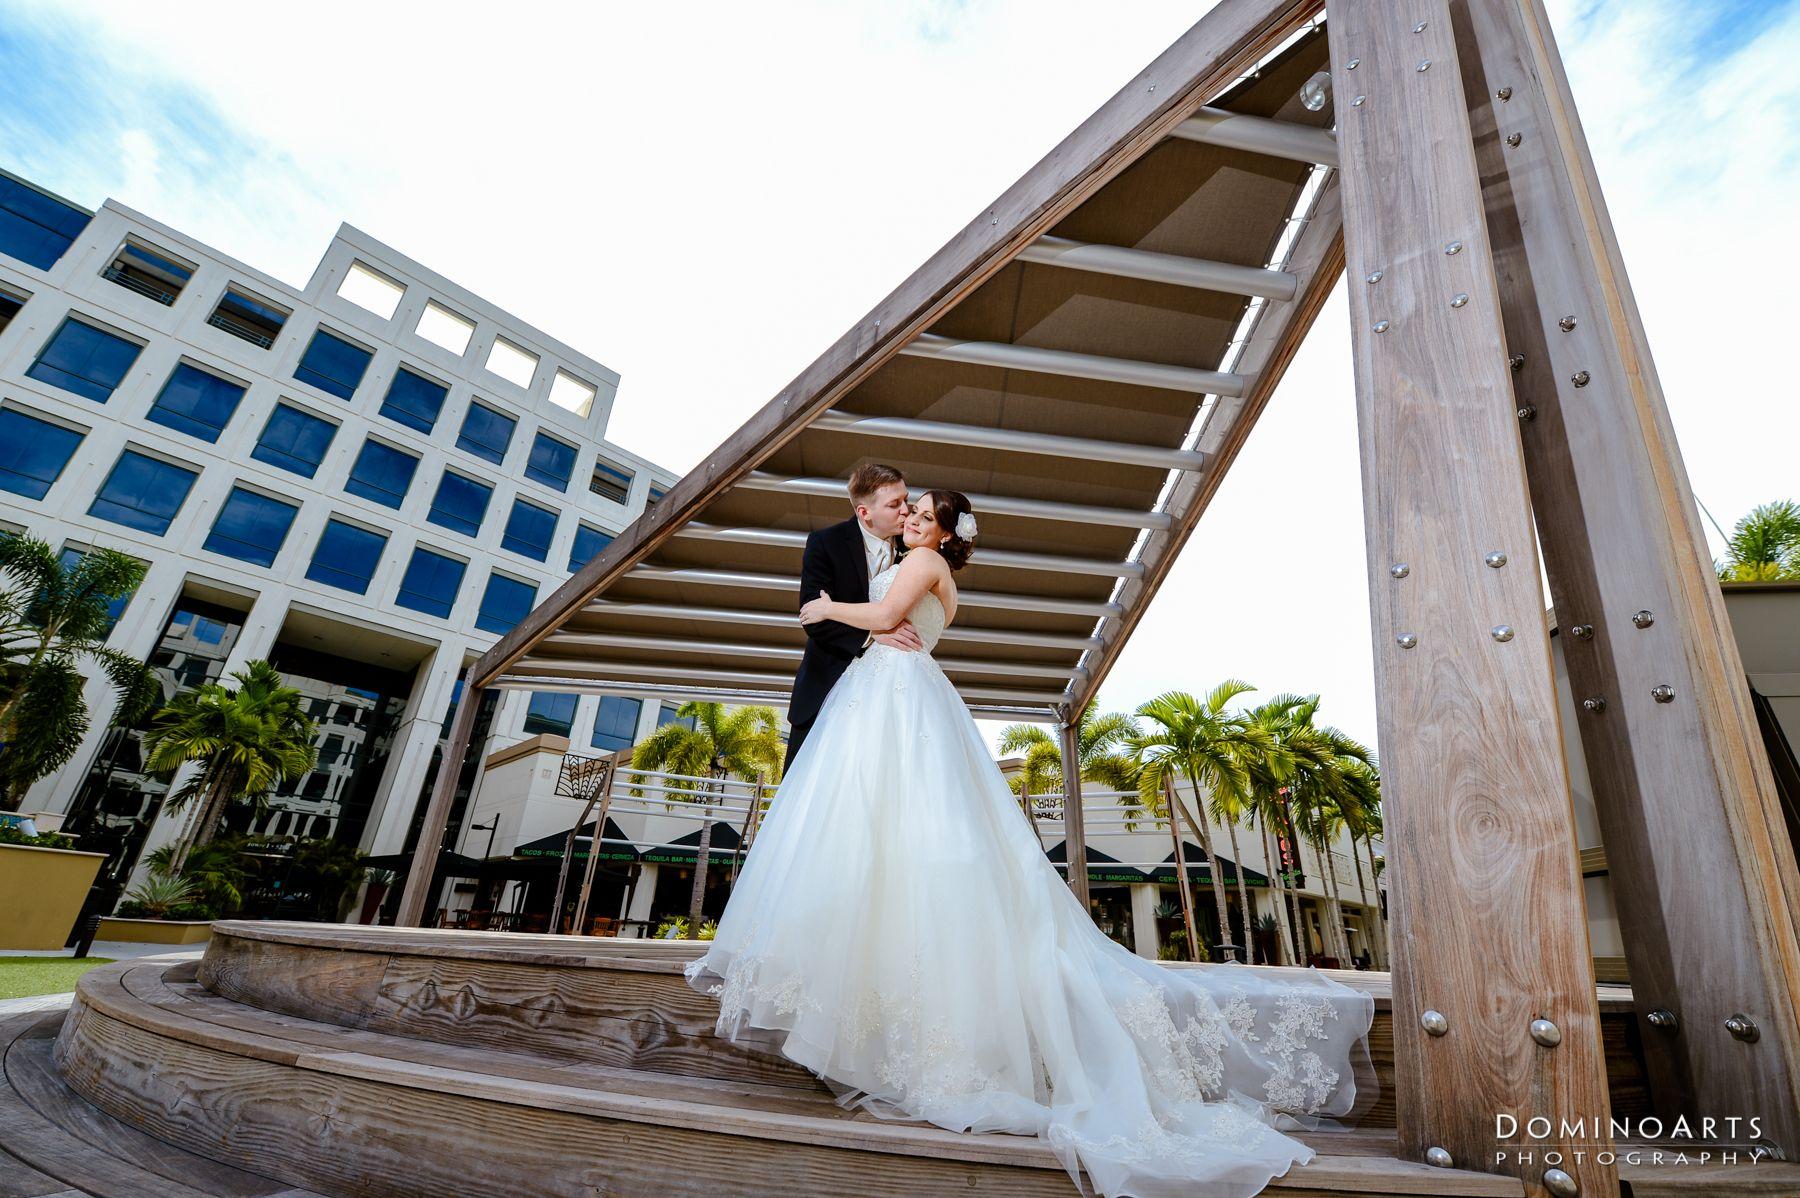 Simanta & Travis' Wedding - Sneak Peek is live! #Love #Bride #Groom #Couple #DominoArts #WeddingPhotography #SouthFlorida